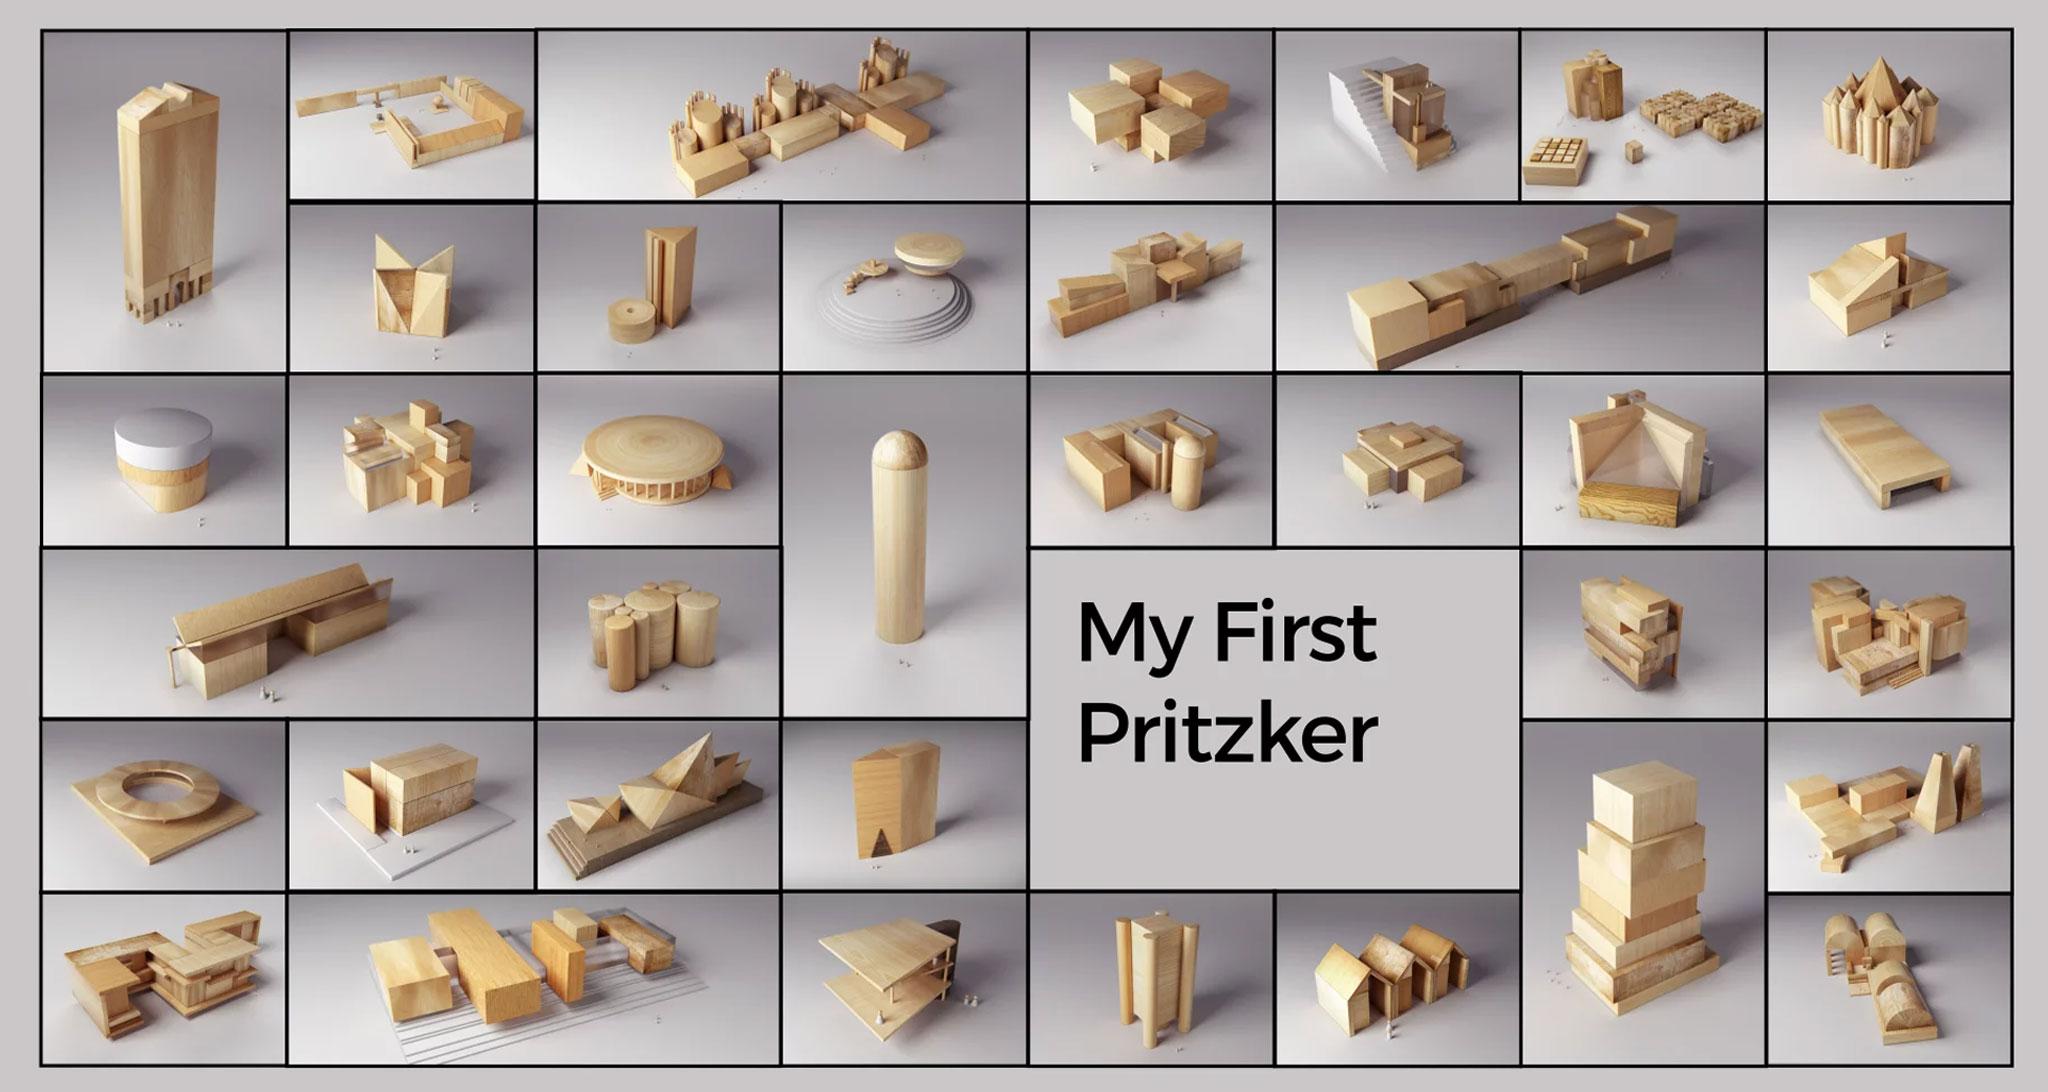 Mi primer Pritzker por Andrea Stinga. Cortesía de Andrea Stinga